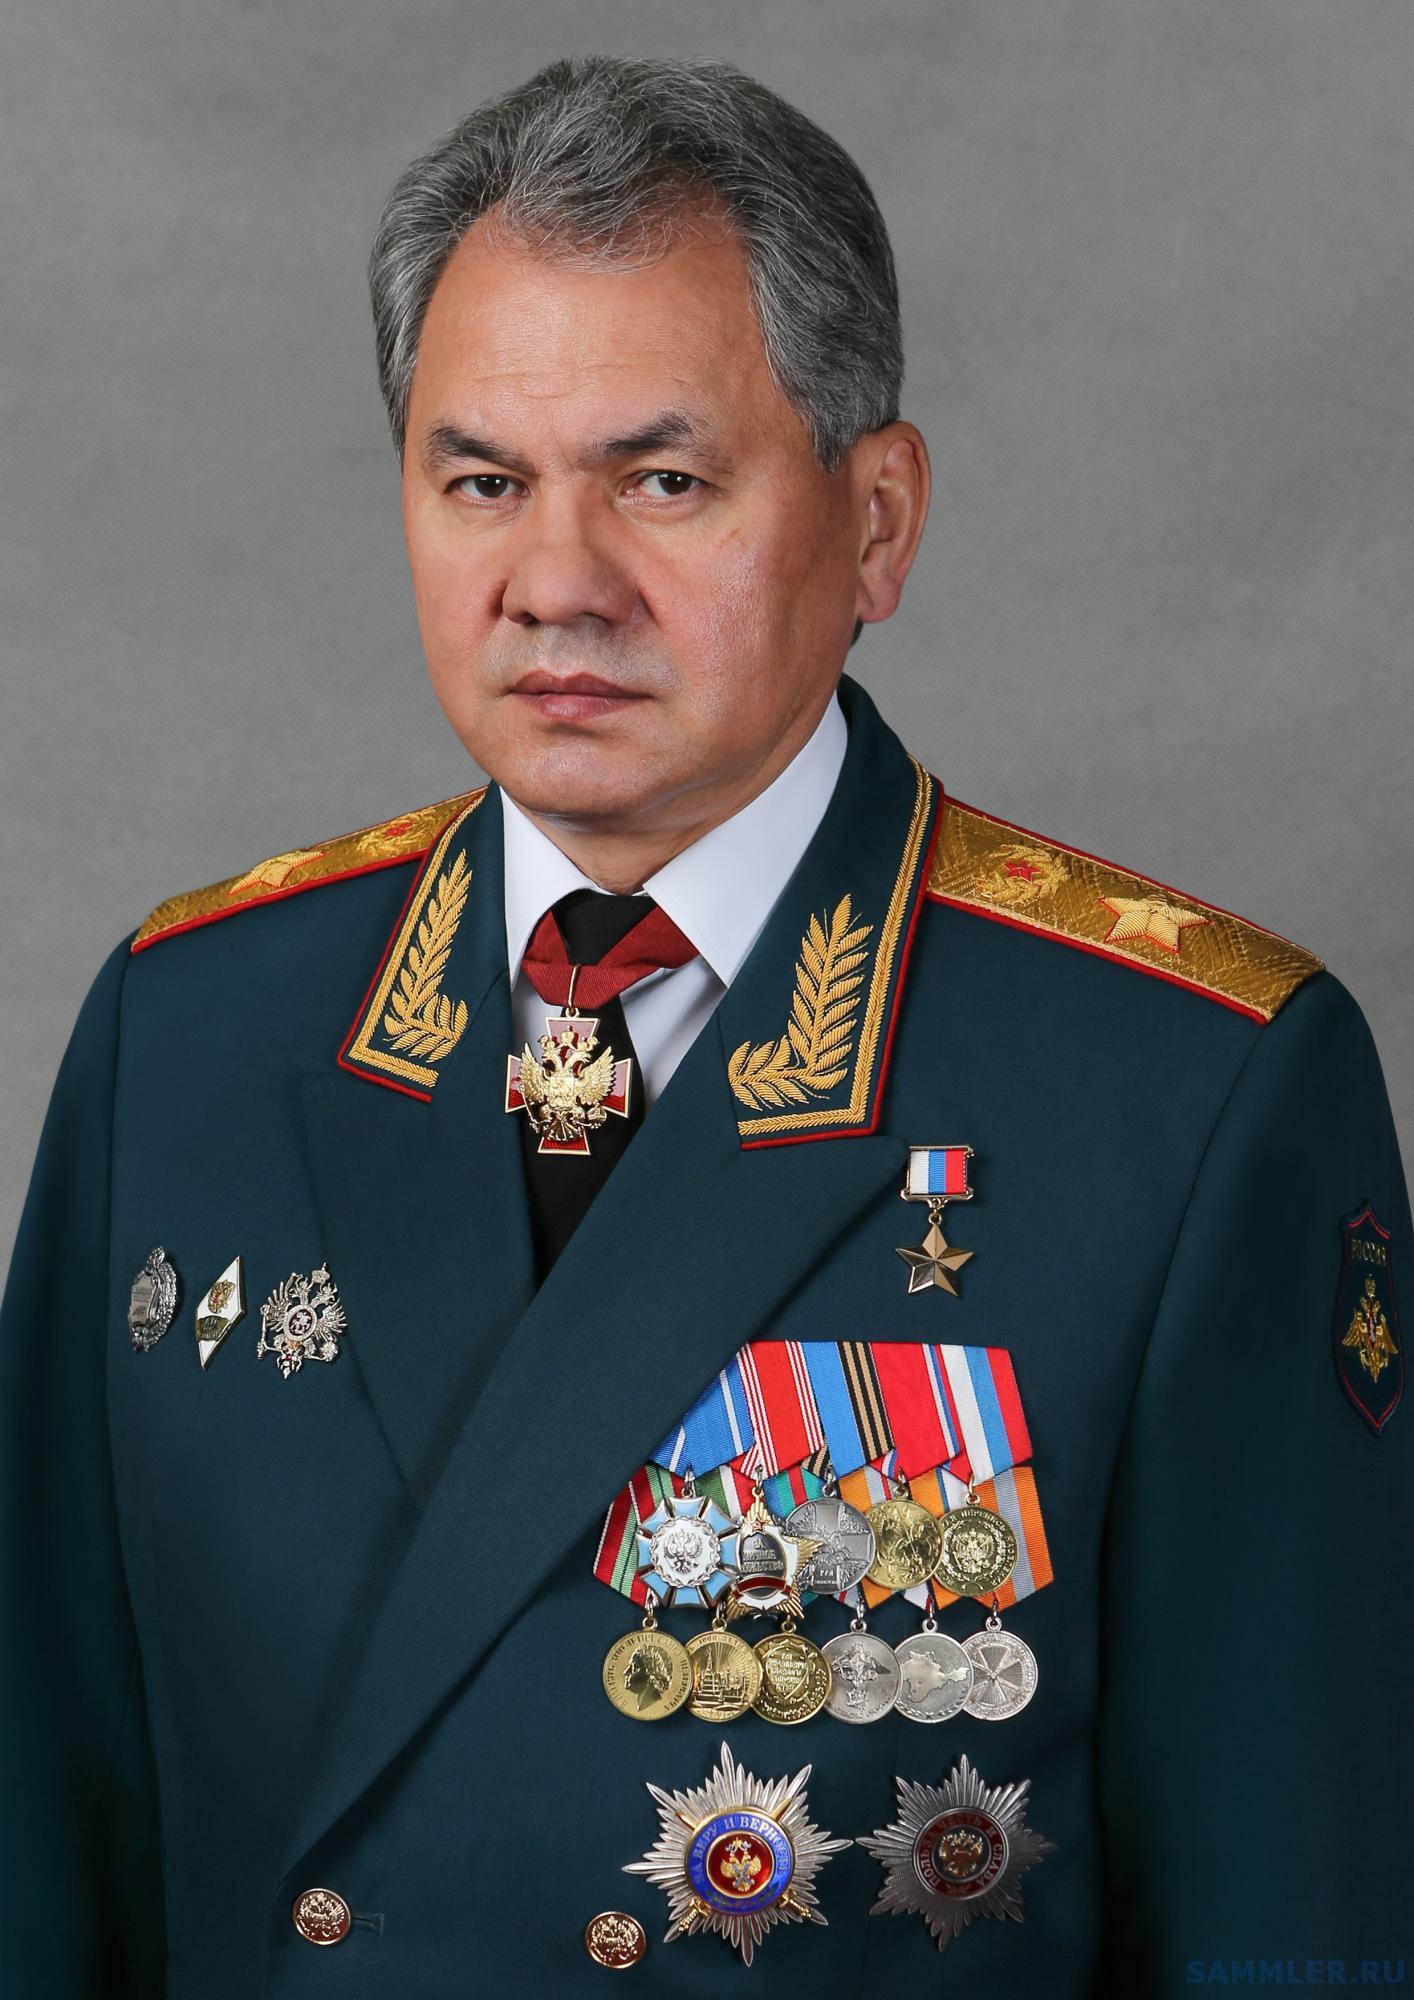 Шойгу Сергей Кожугетович - официальное фото 2014 - 2.jpg